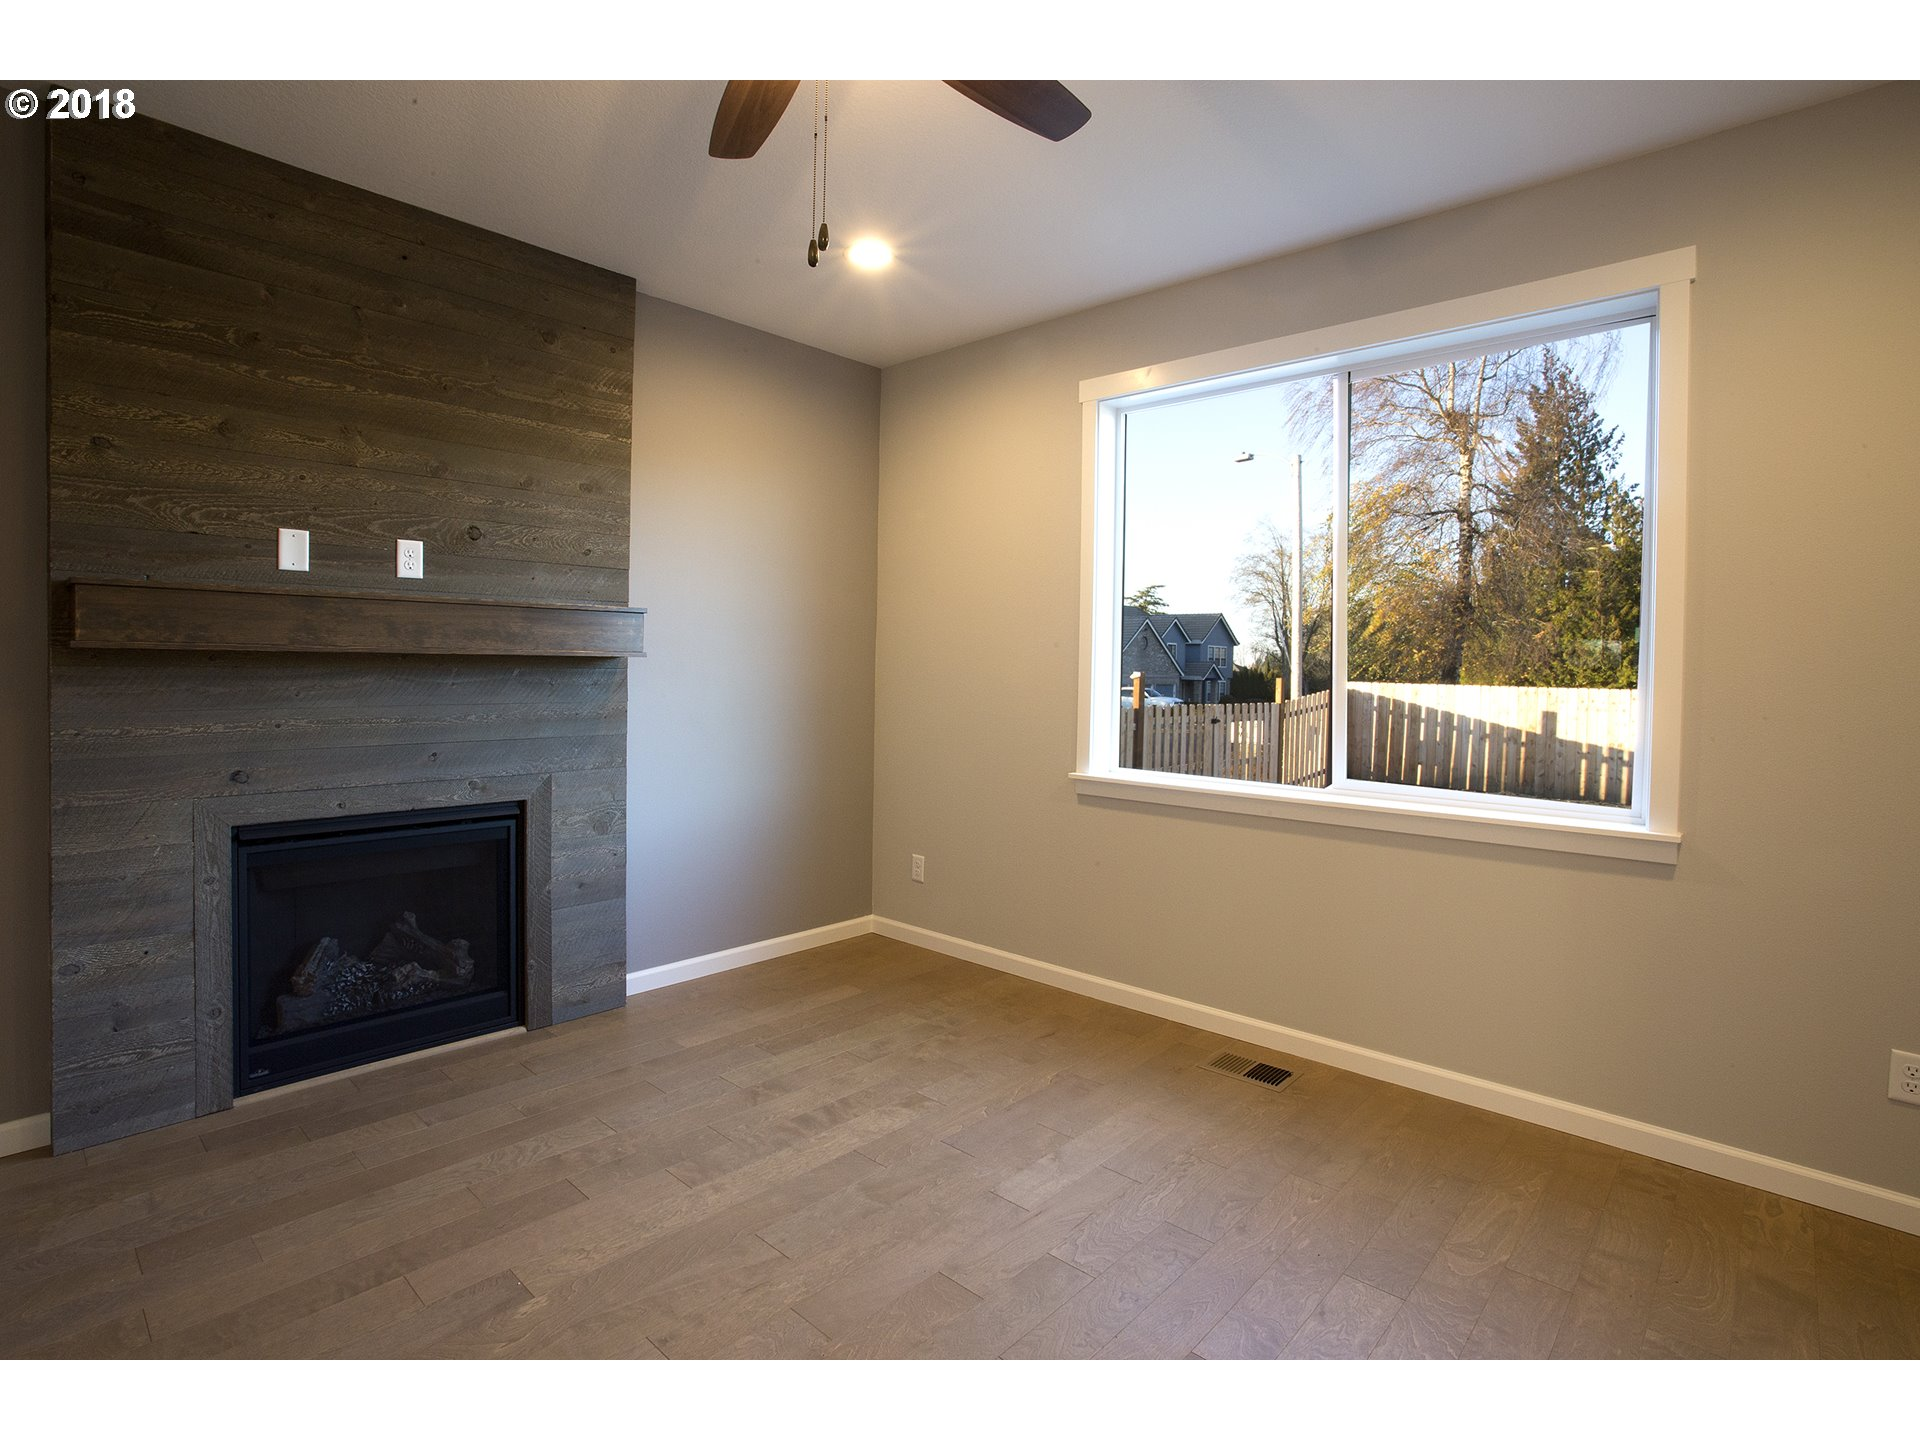 5807 SE 33rd ST Gresham, OR 97080 - MLS #: 18510796